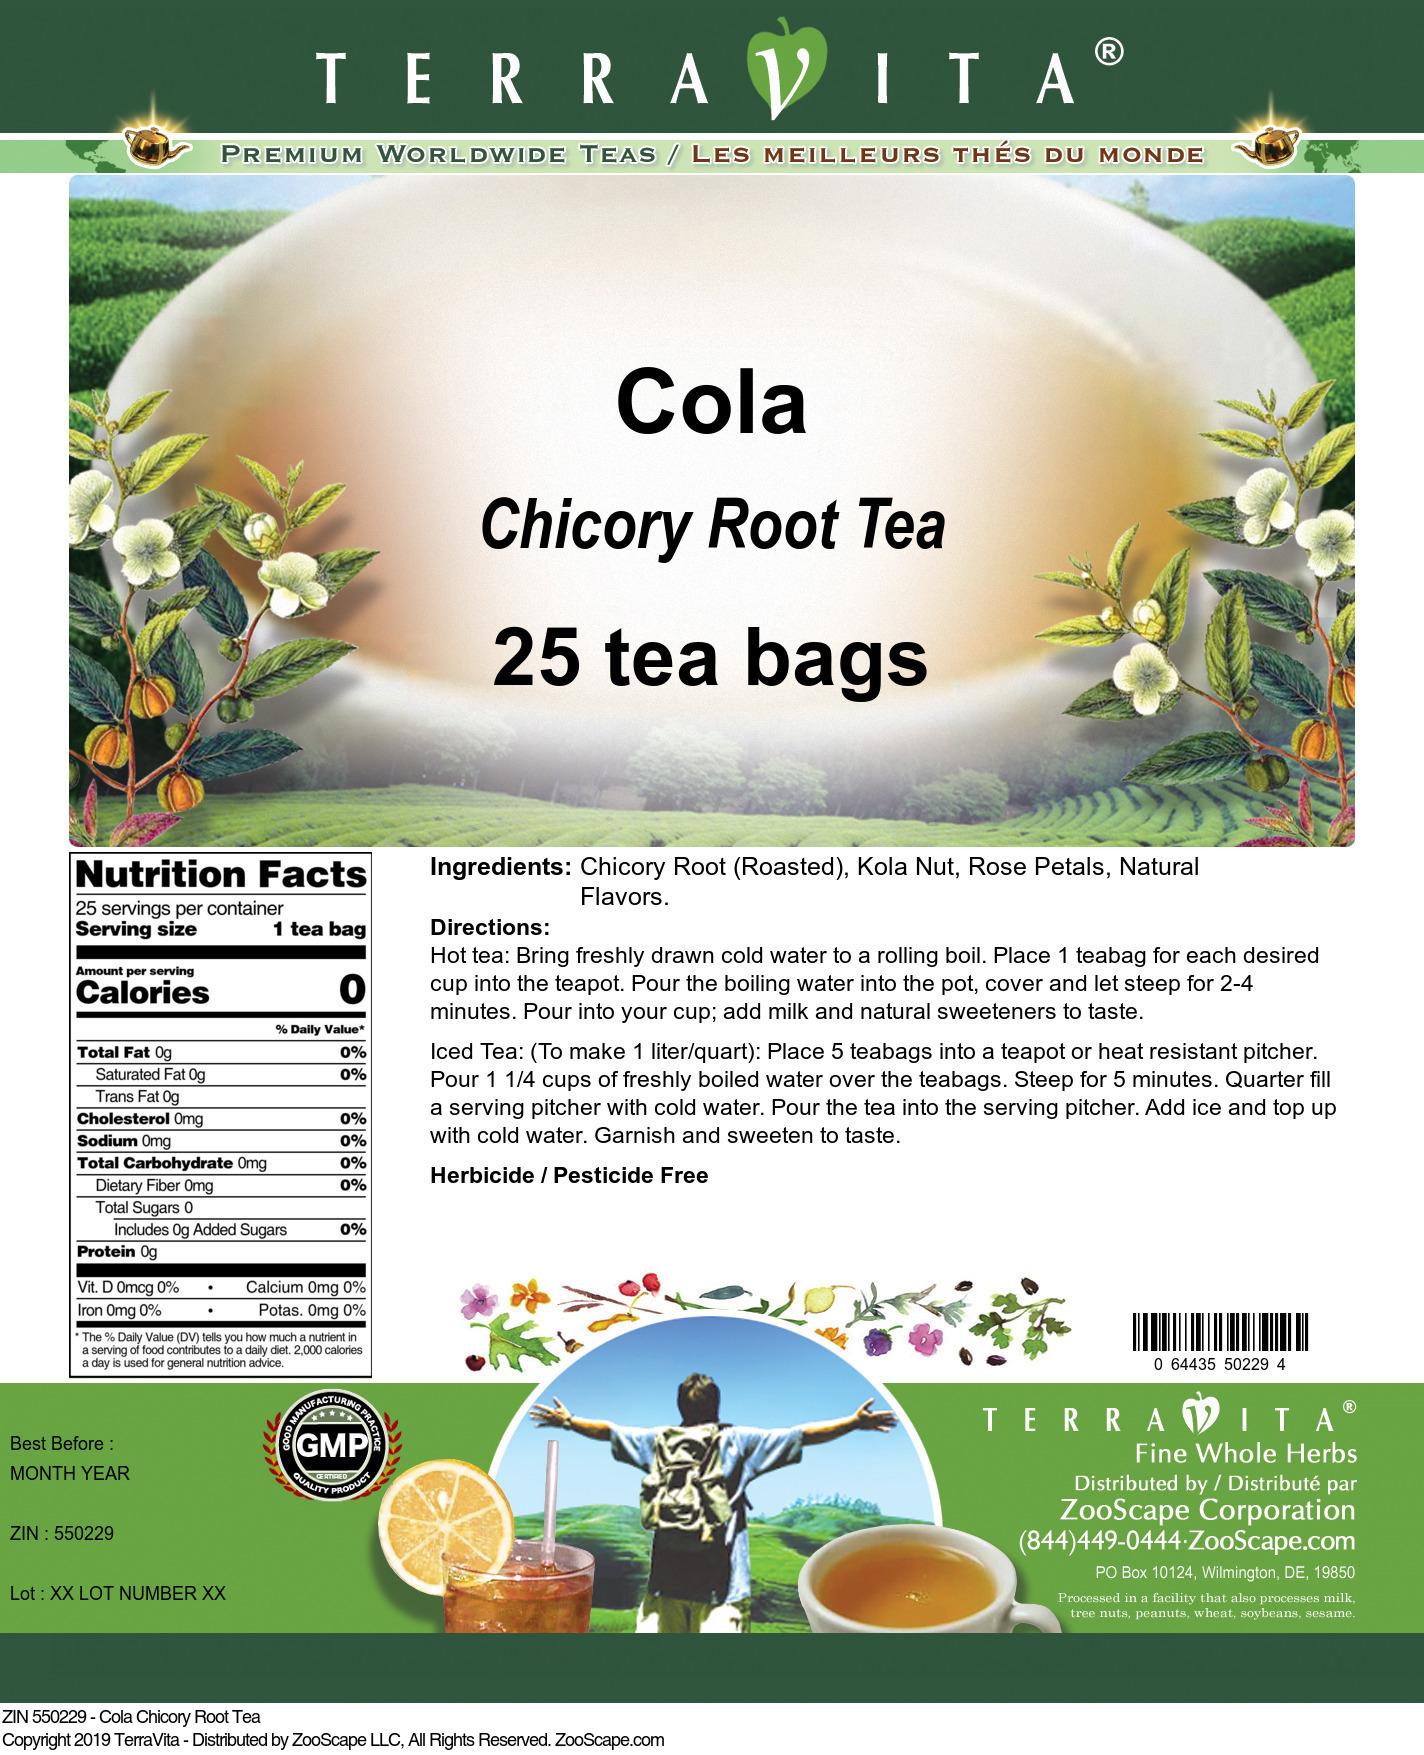 Cola Chicory Root Tea